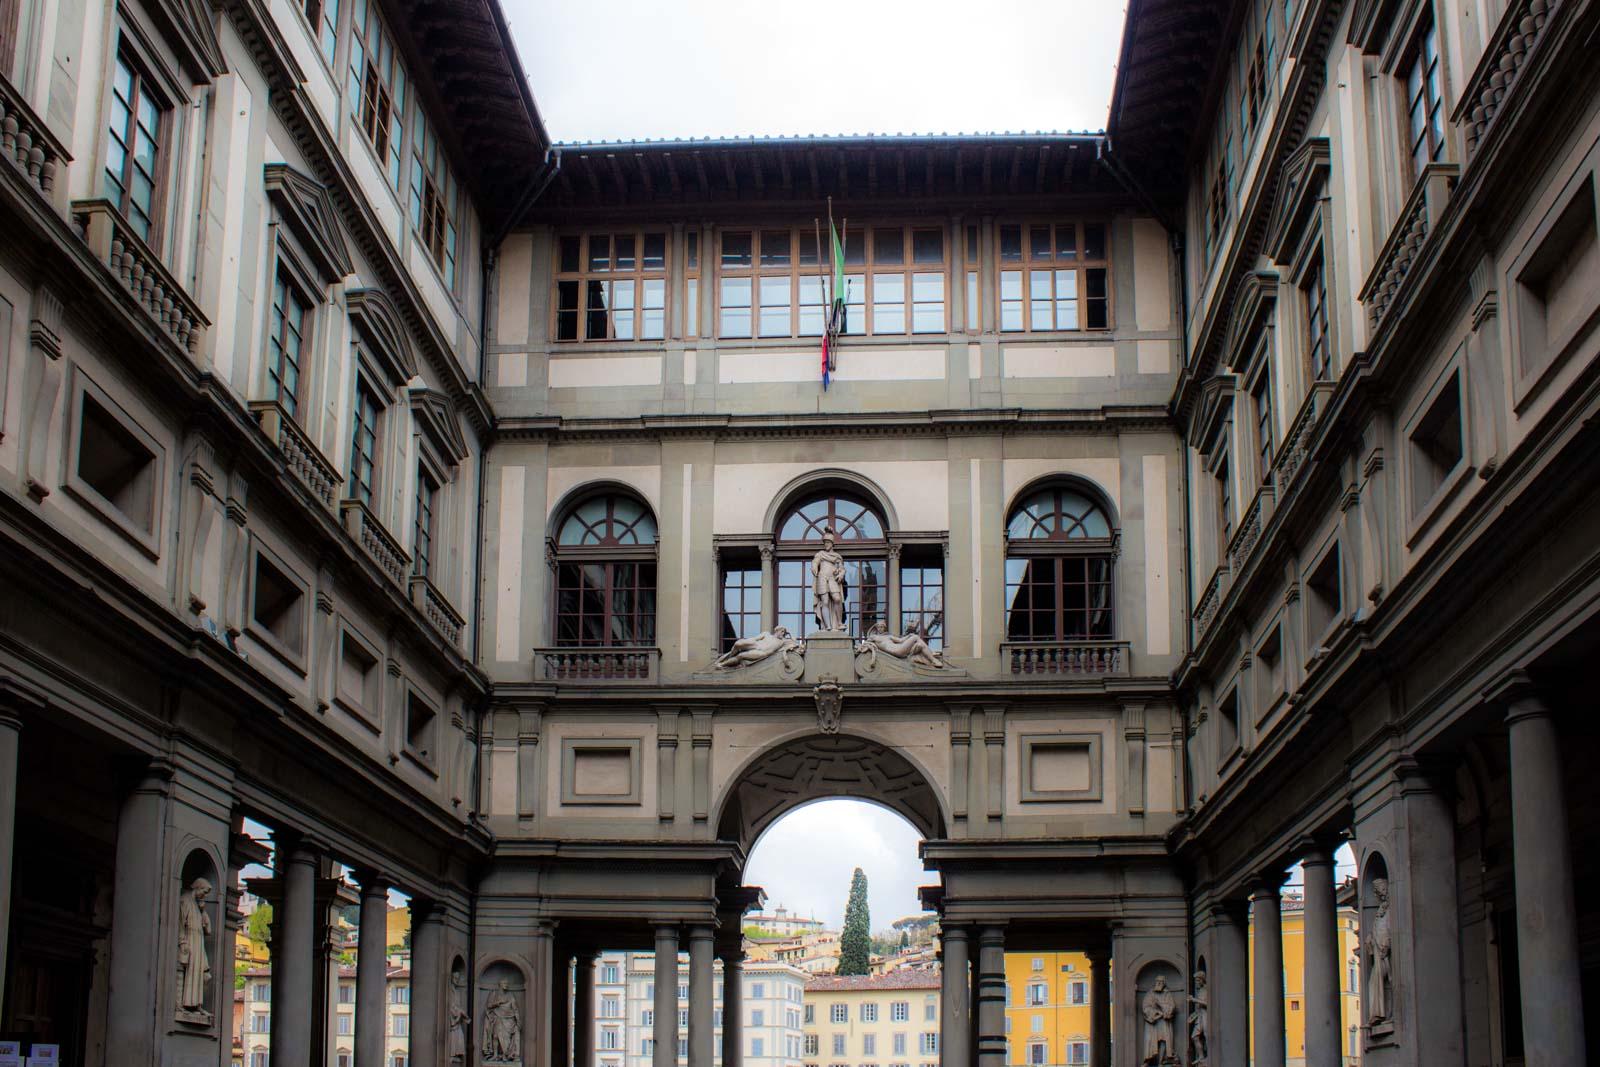 The most beautiful woman in Florence: Venus de' Medici in